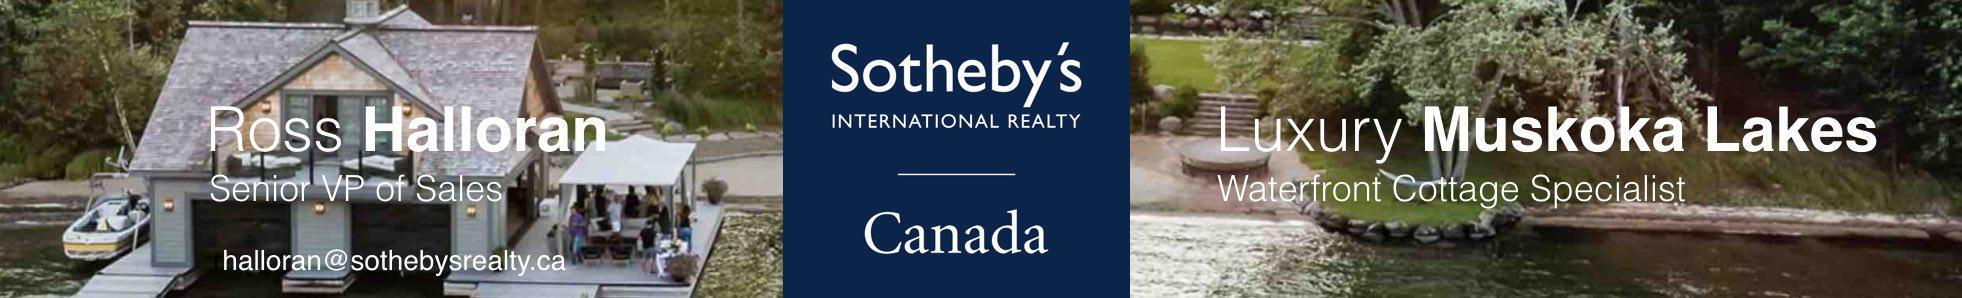 Ross Halloran Ad - Sothebys